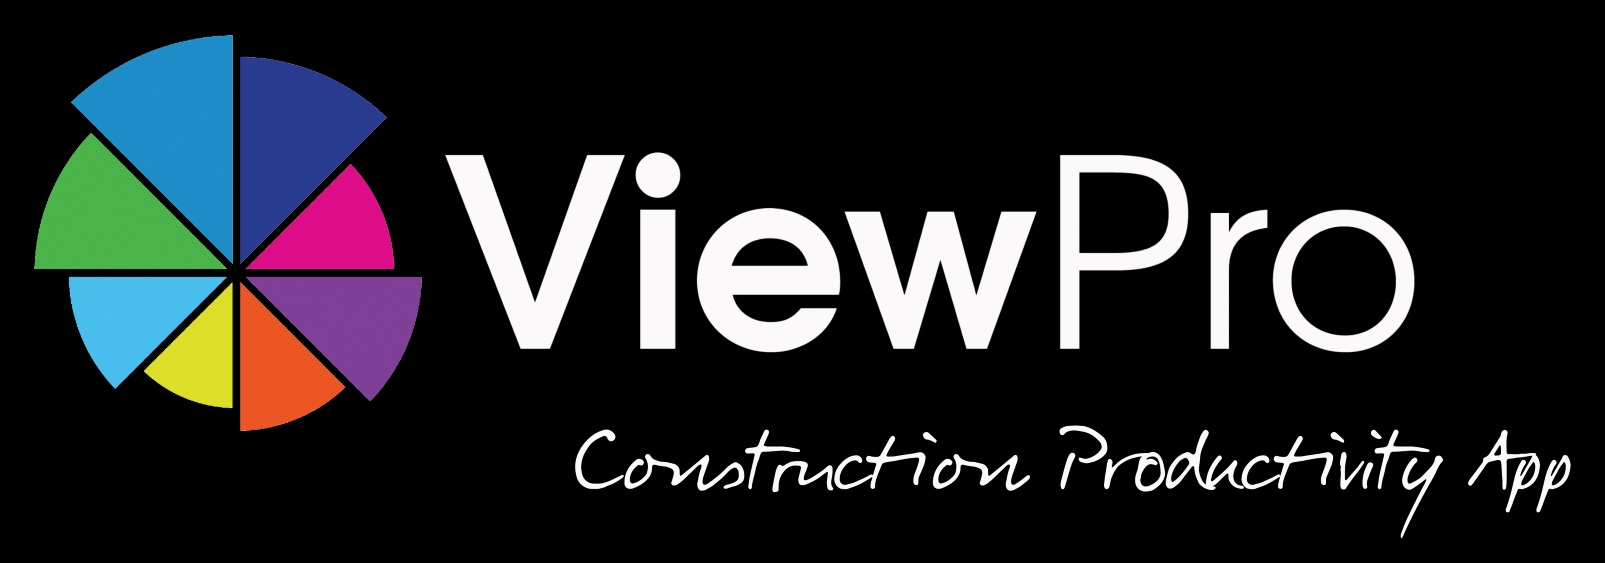 ViewPro Construction logo